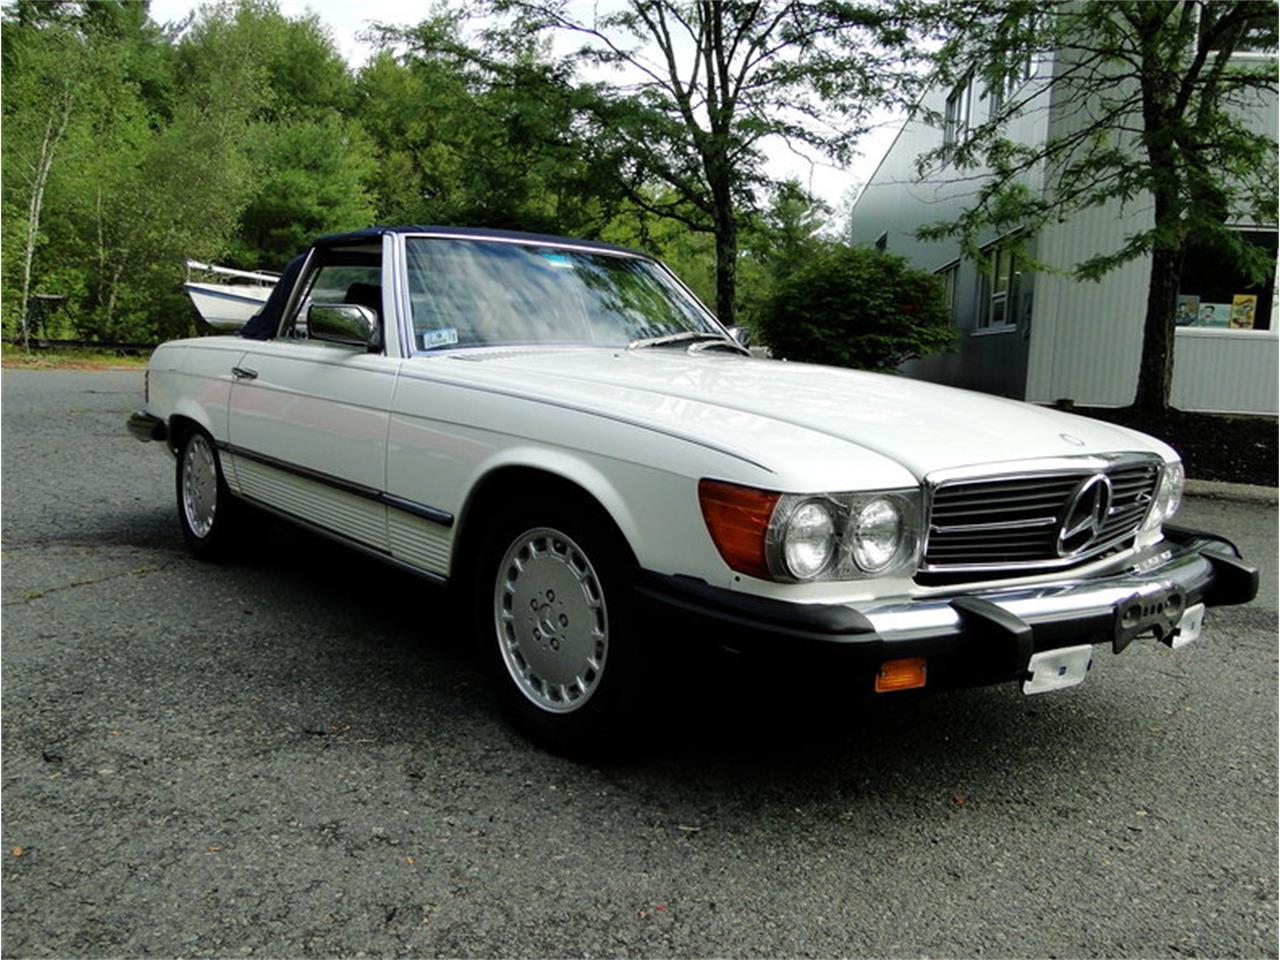 1984 Mercedes-Benz 380SL for Sale | ClassicCars.com | CC-895899